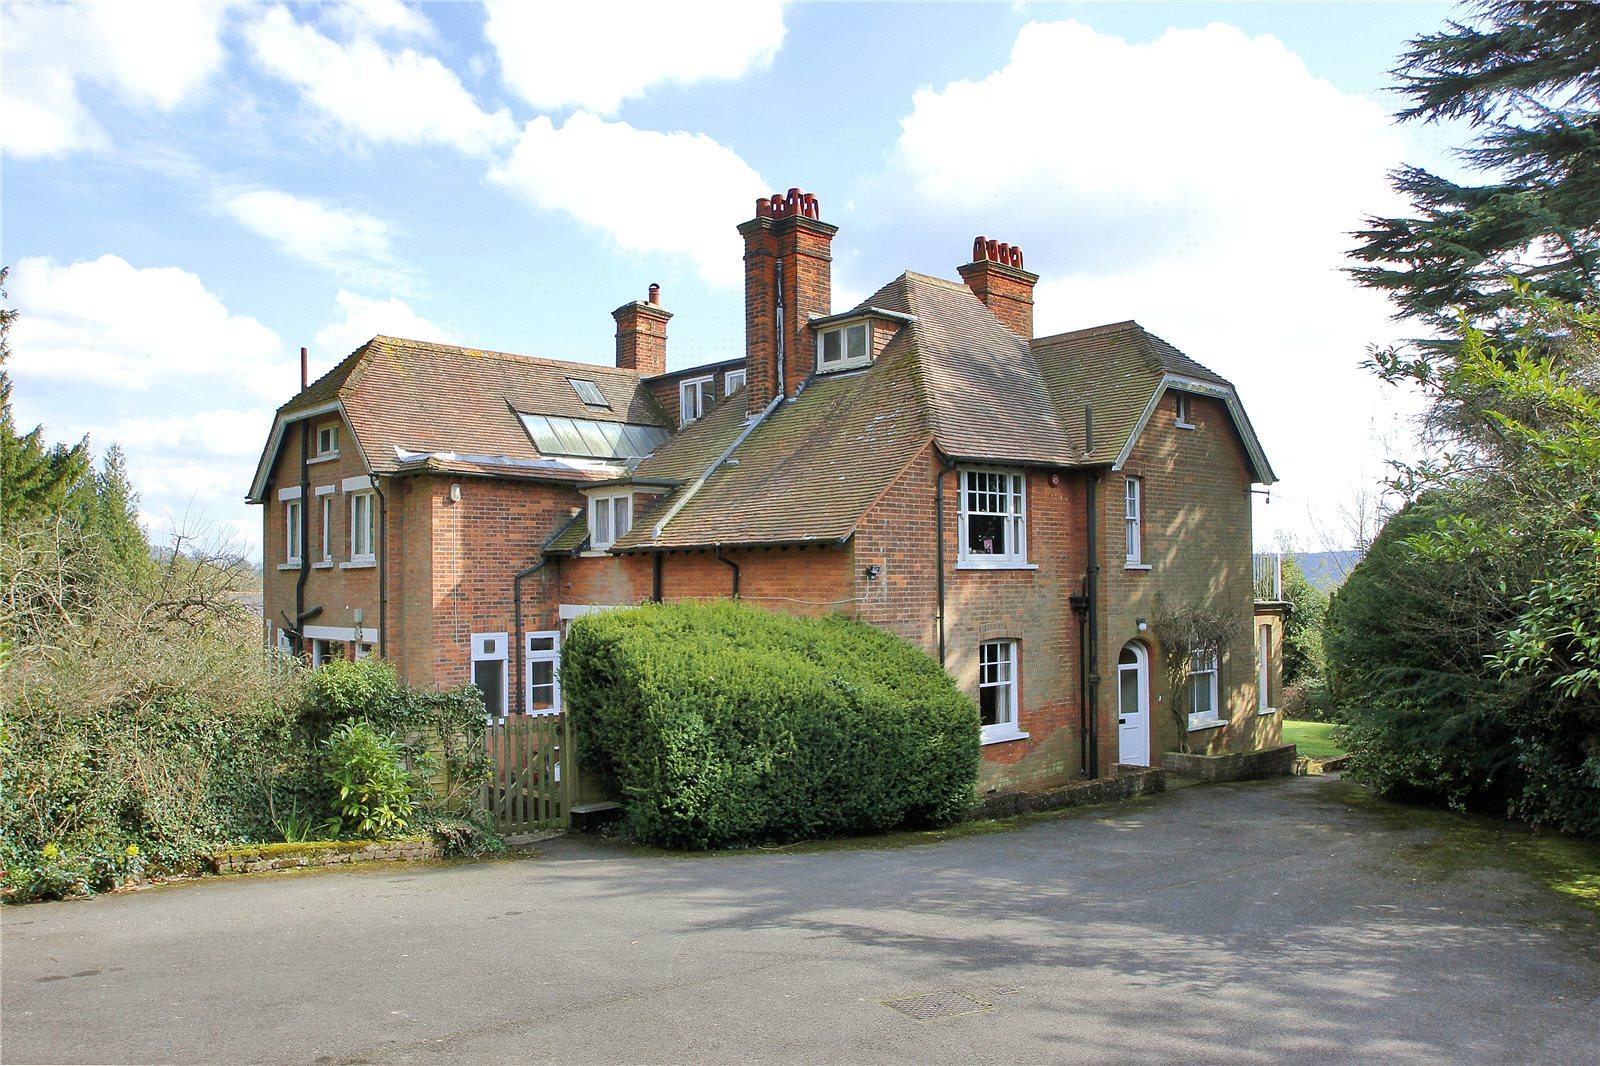 Single Family Home for Sale at Cotmans Ash Lane, Kemsing, Sevenoaks, Kent, TN15 Sevenoaks, England